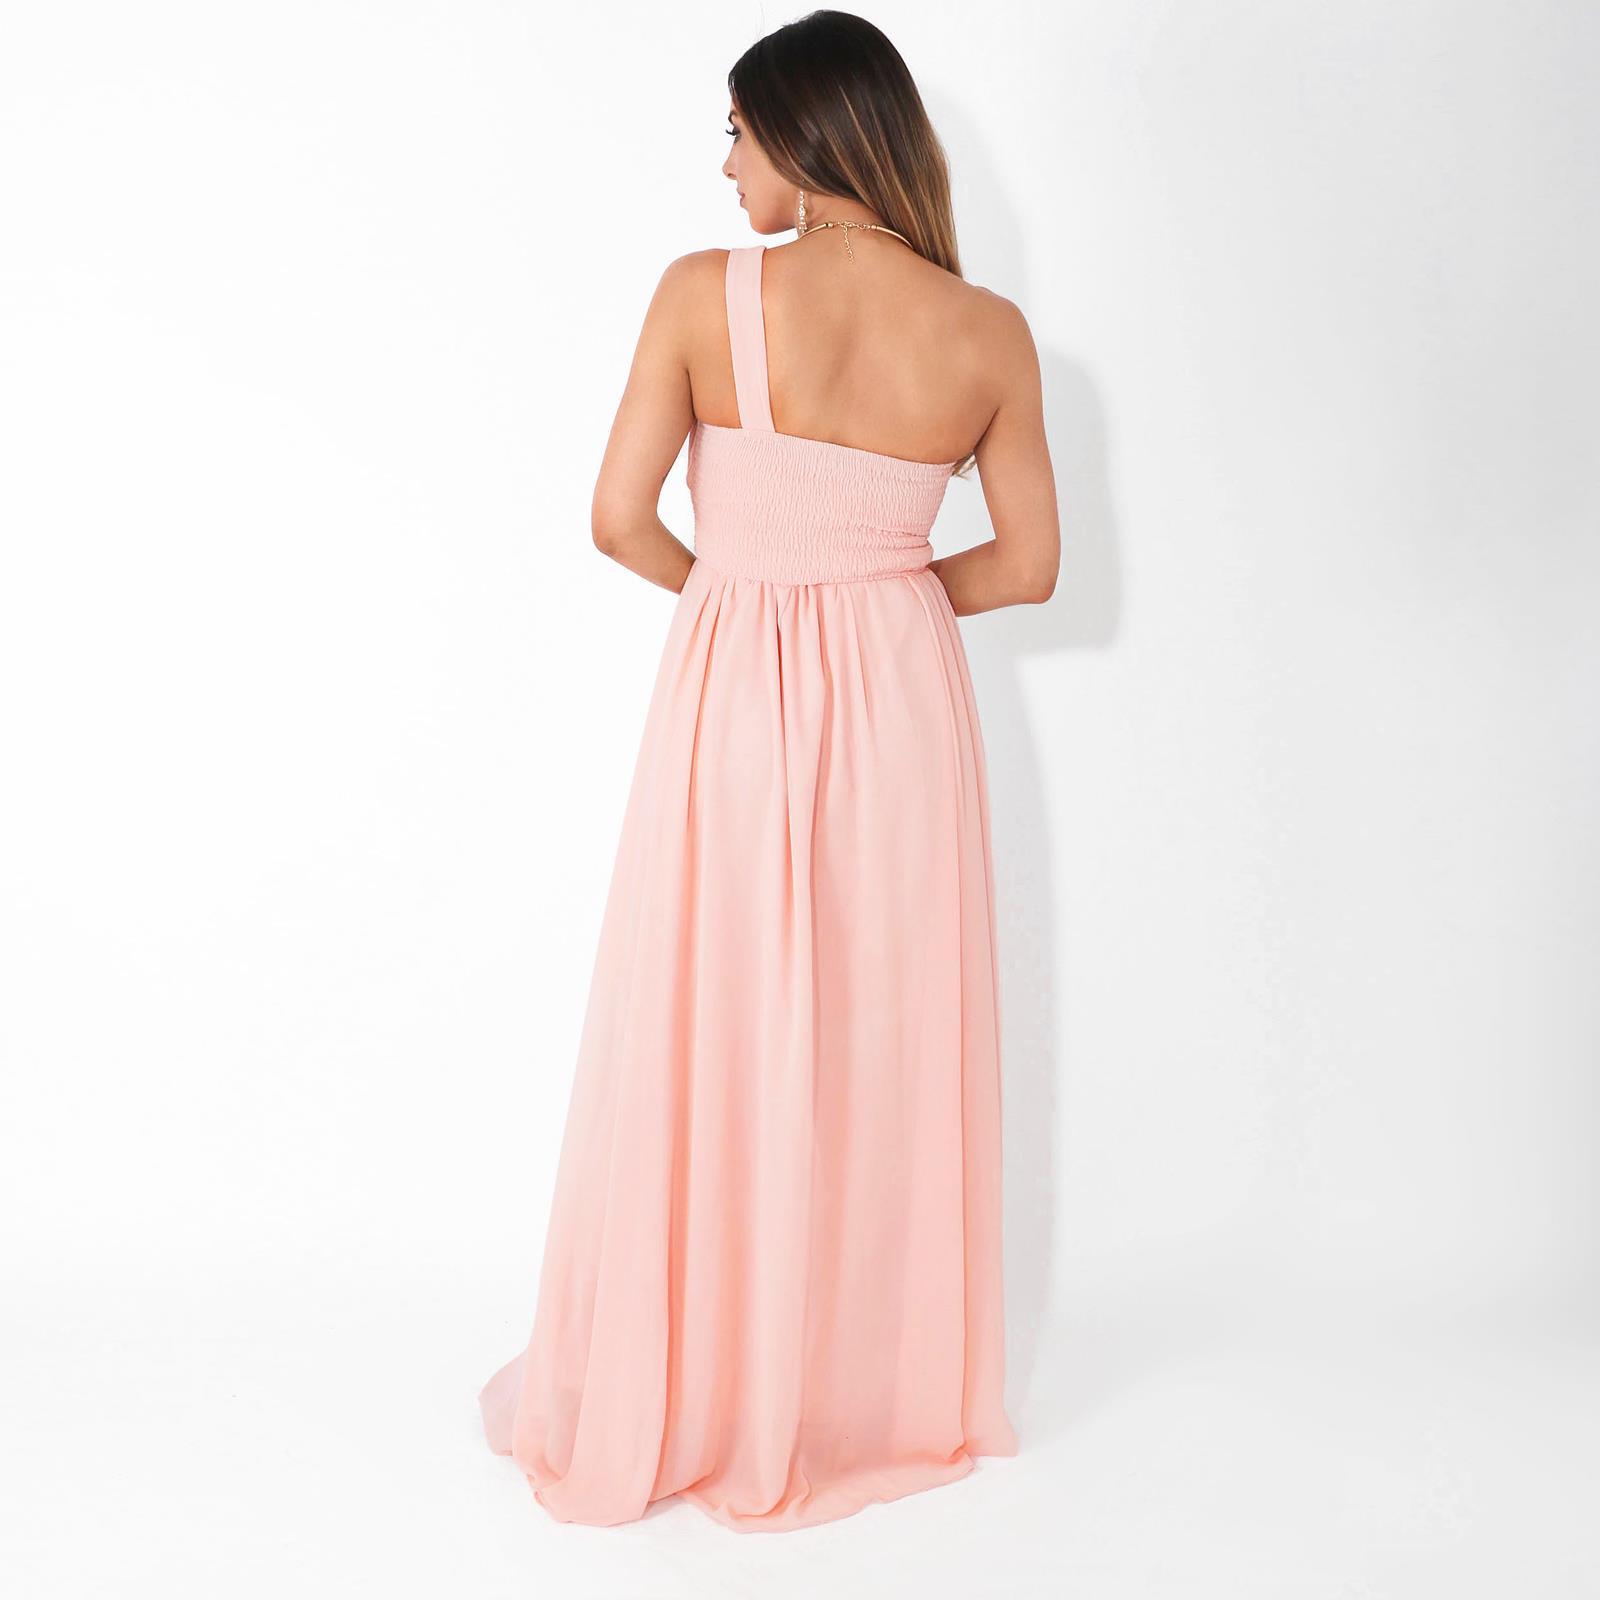 Womens-Wedding-Bridesmaid-Prom-Dress-Formal-One-Off-Shoulder-Long-Evening-8-18 thumbnail 50